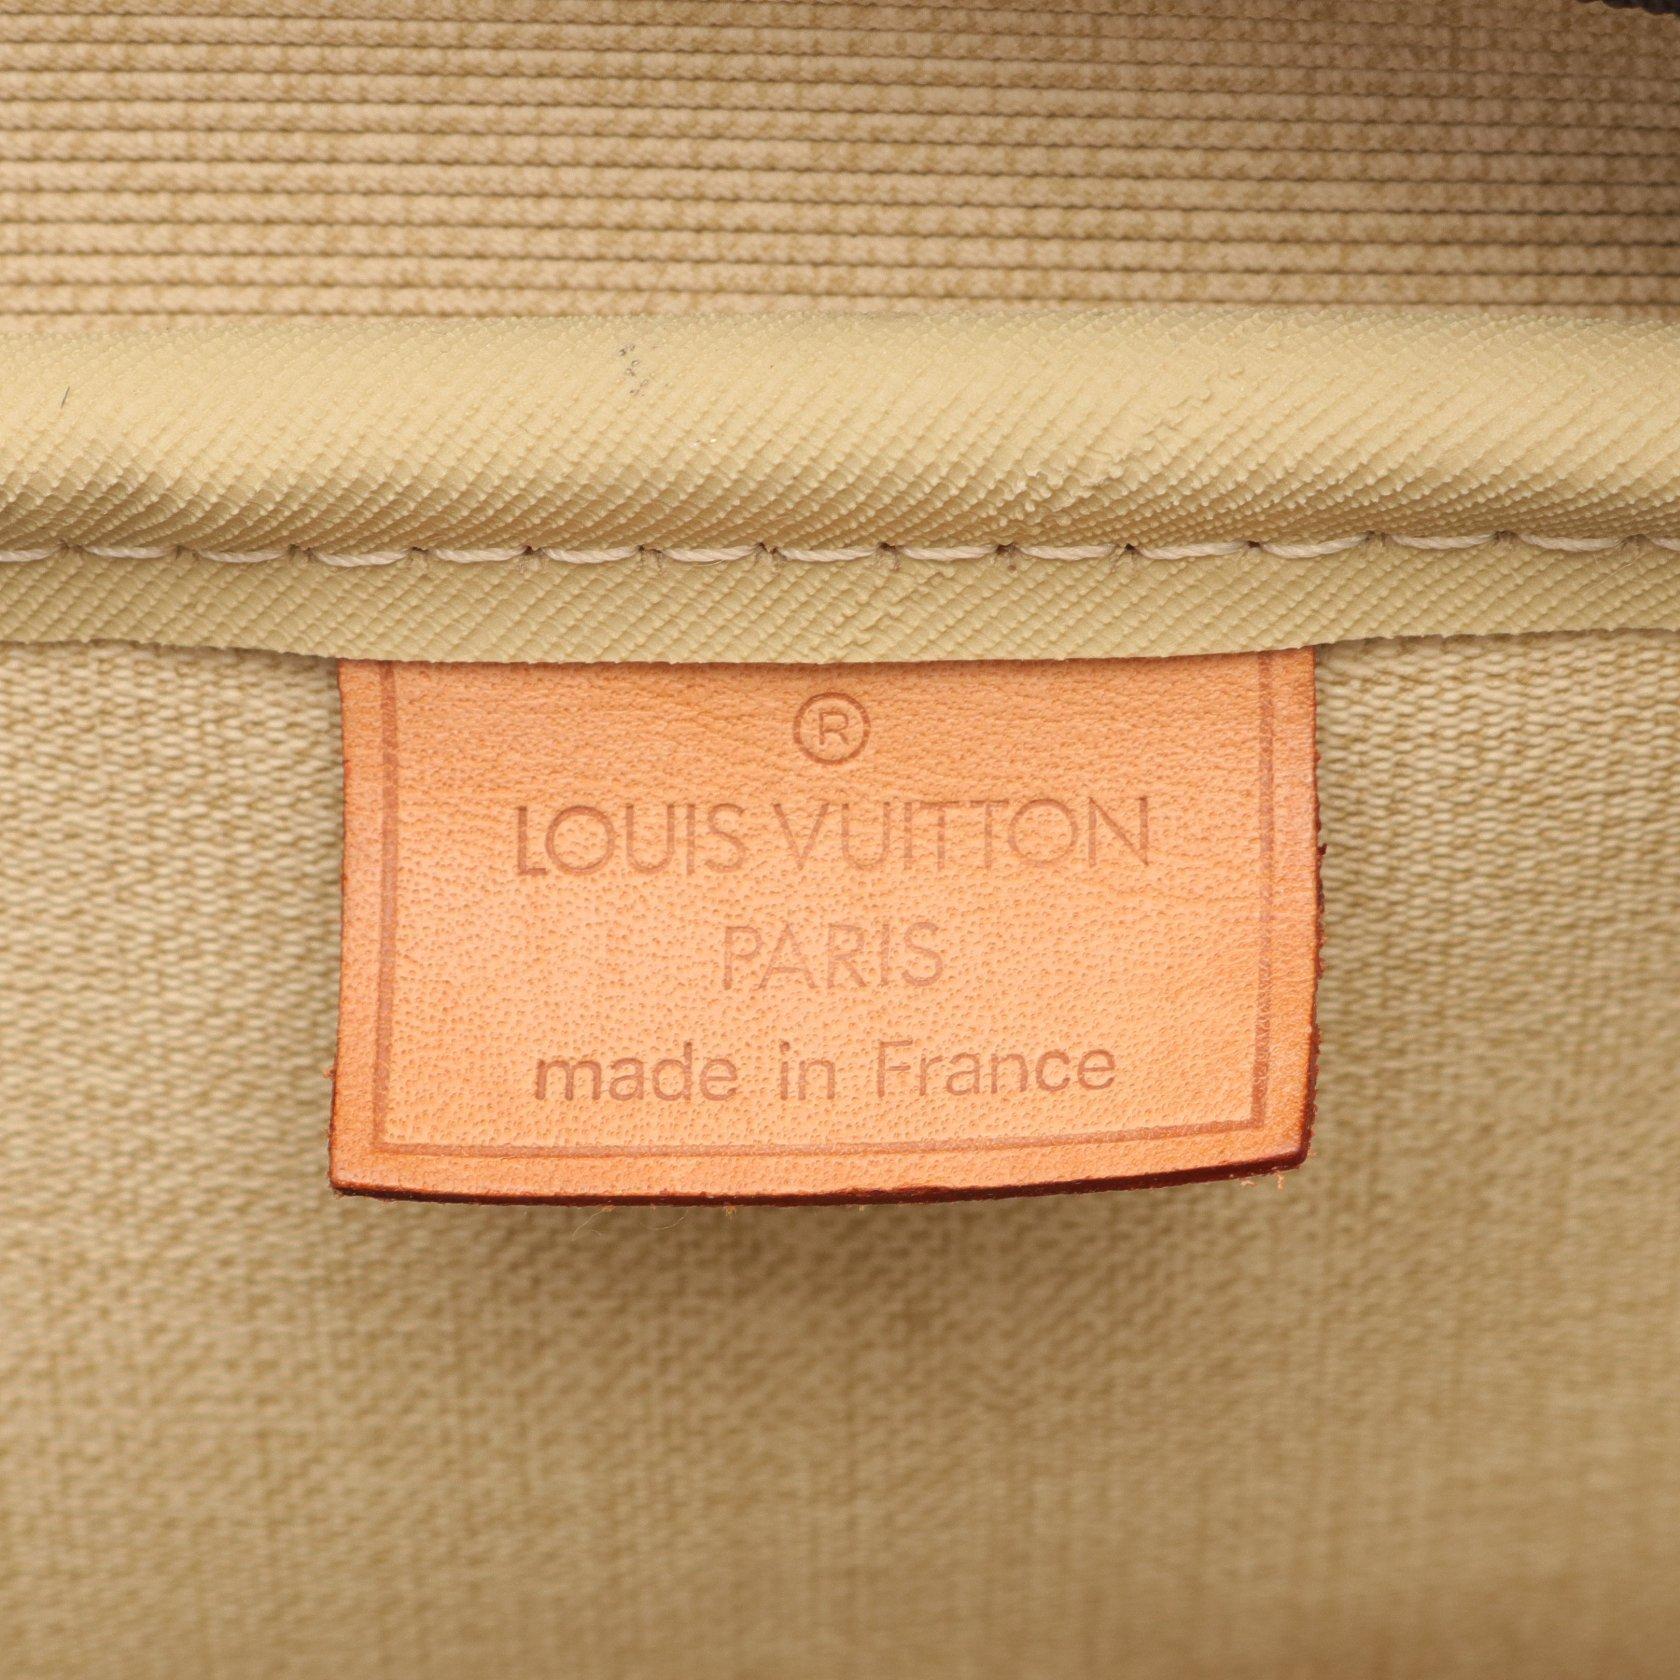 LOUIS VUITTON・バッグ・ドーヴィル ボーリングヴァニティ モノグラム ハンドバッグ PVC レザー ブラウン